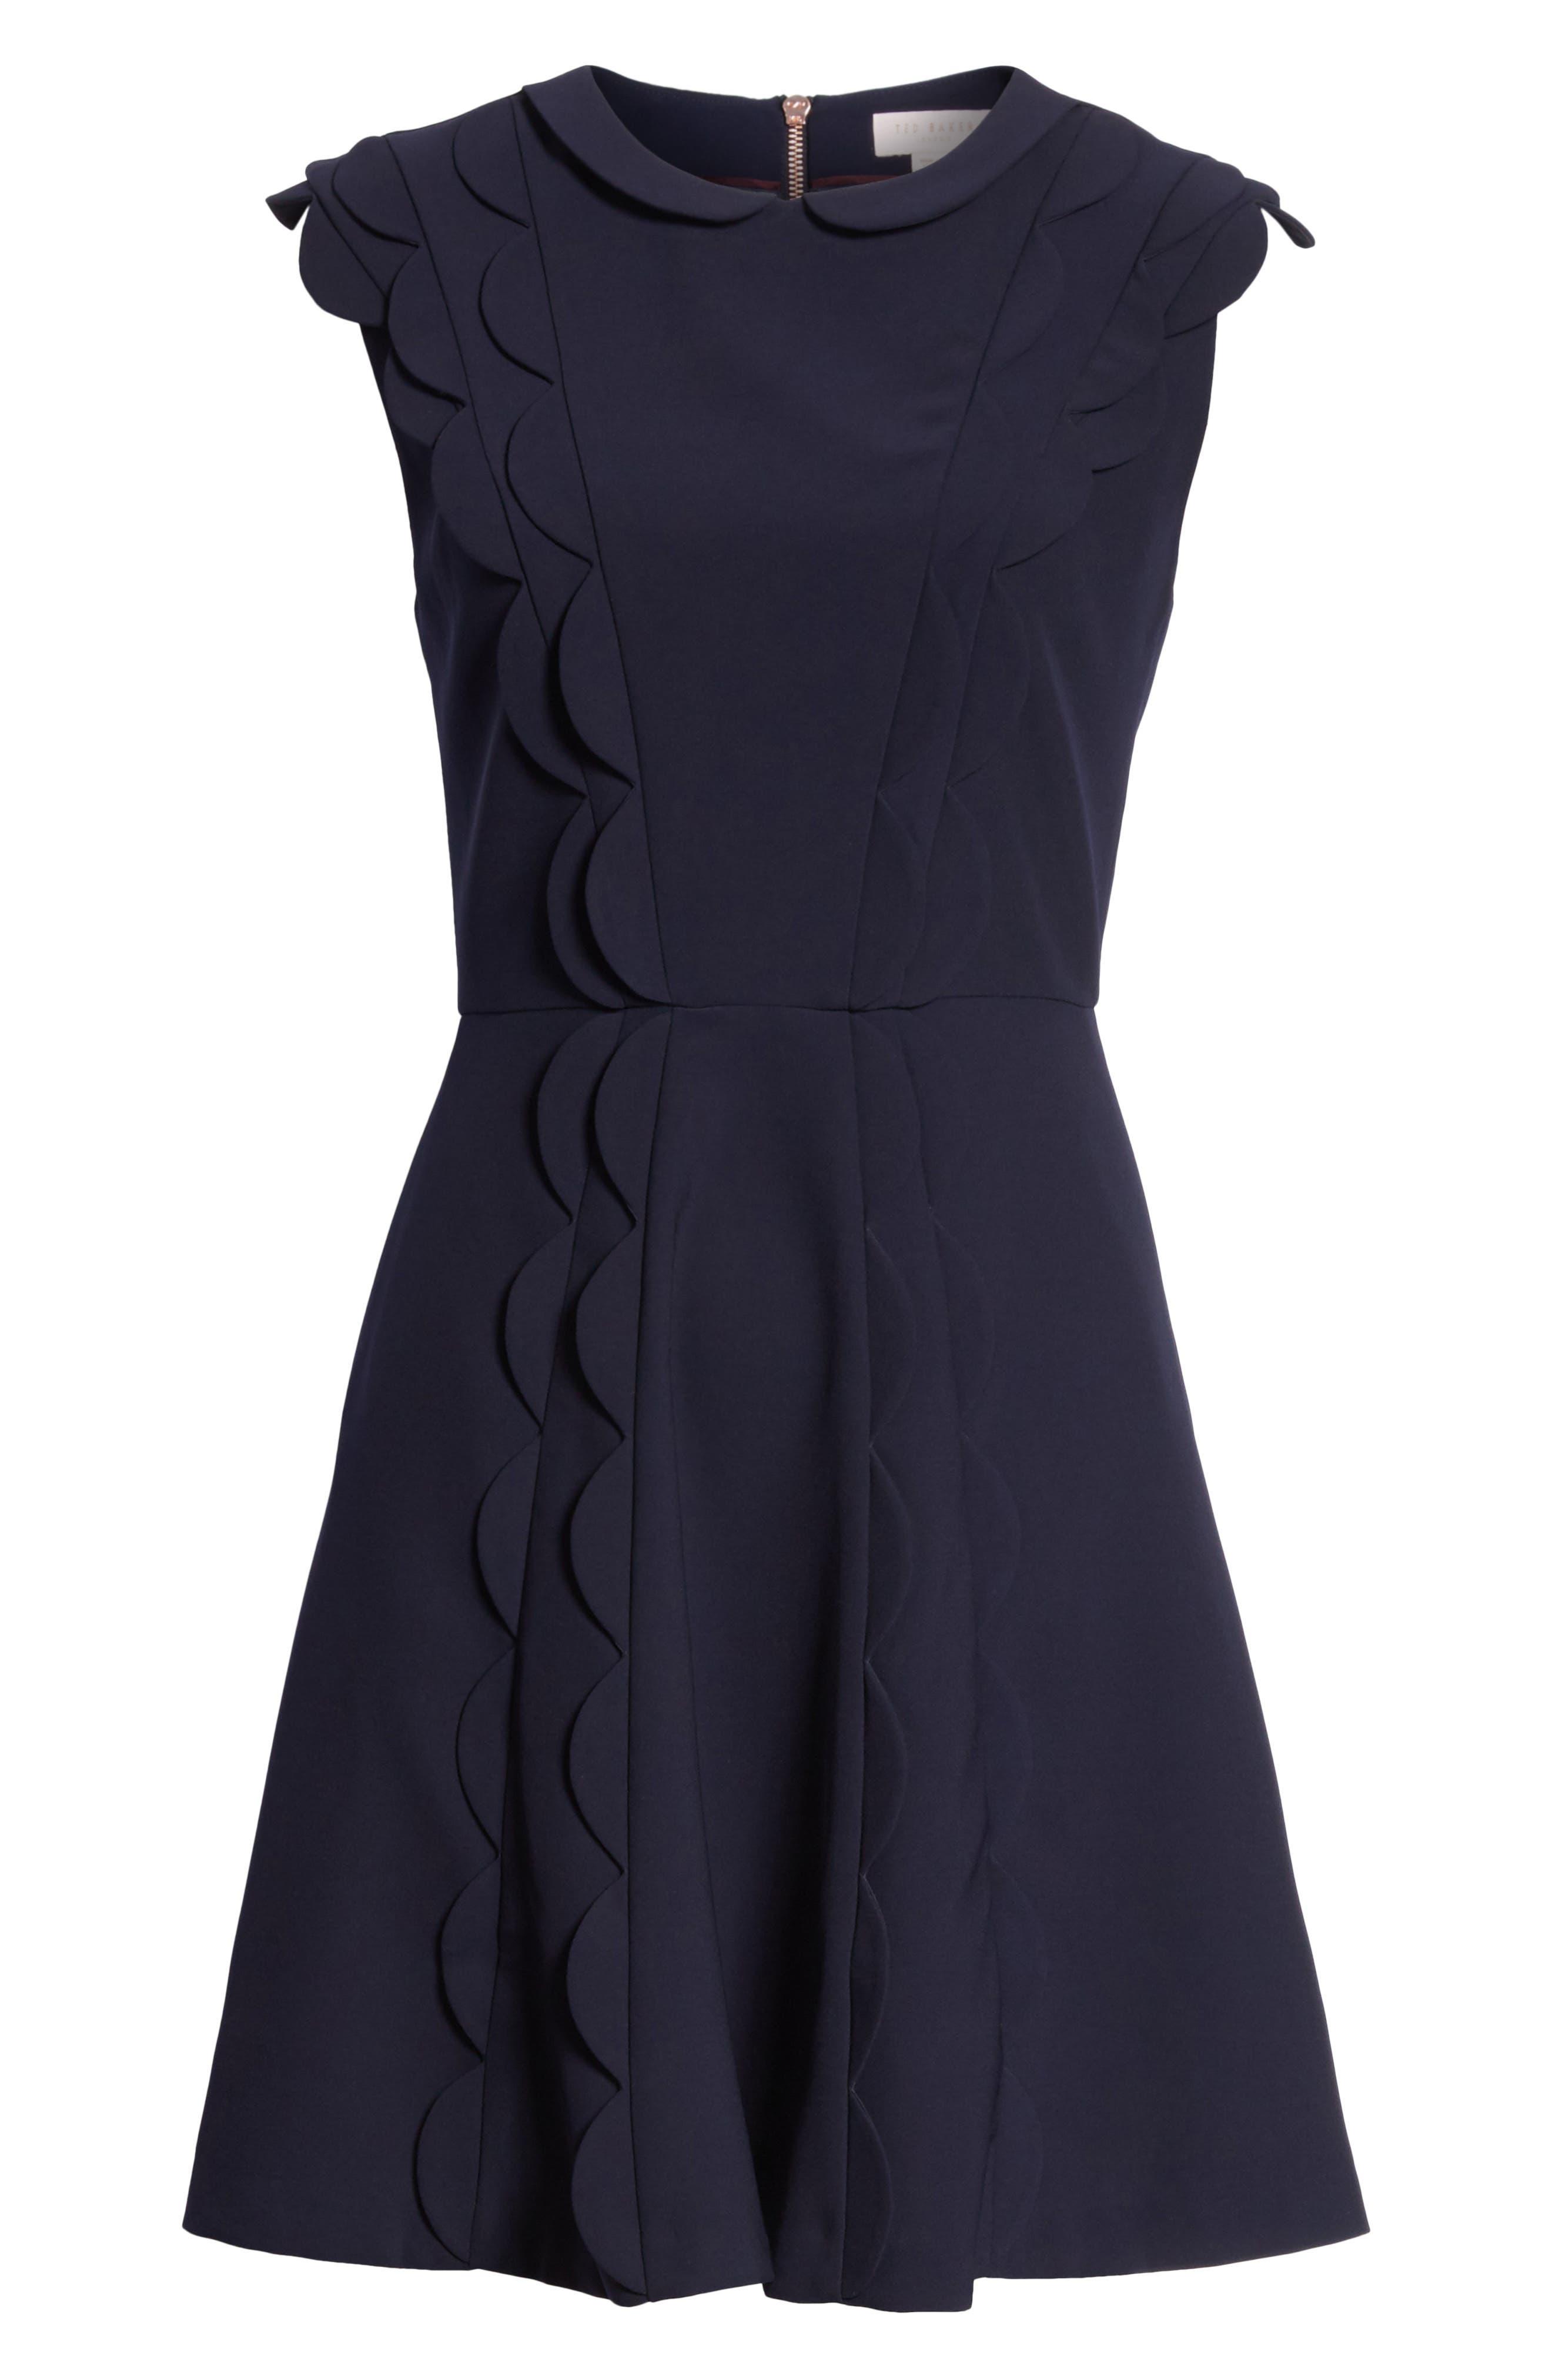 Scalloped Panel Fit & Flare Dress,                             Alternate thumbnail 6, color,                             402